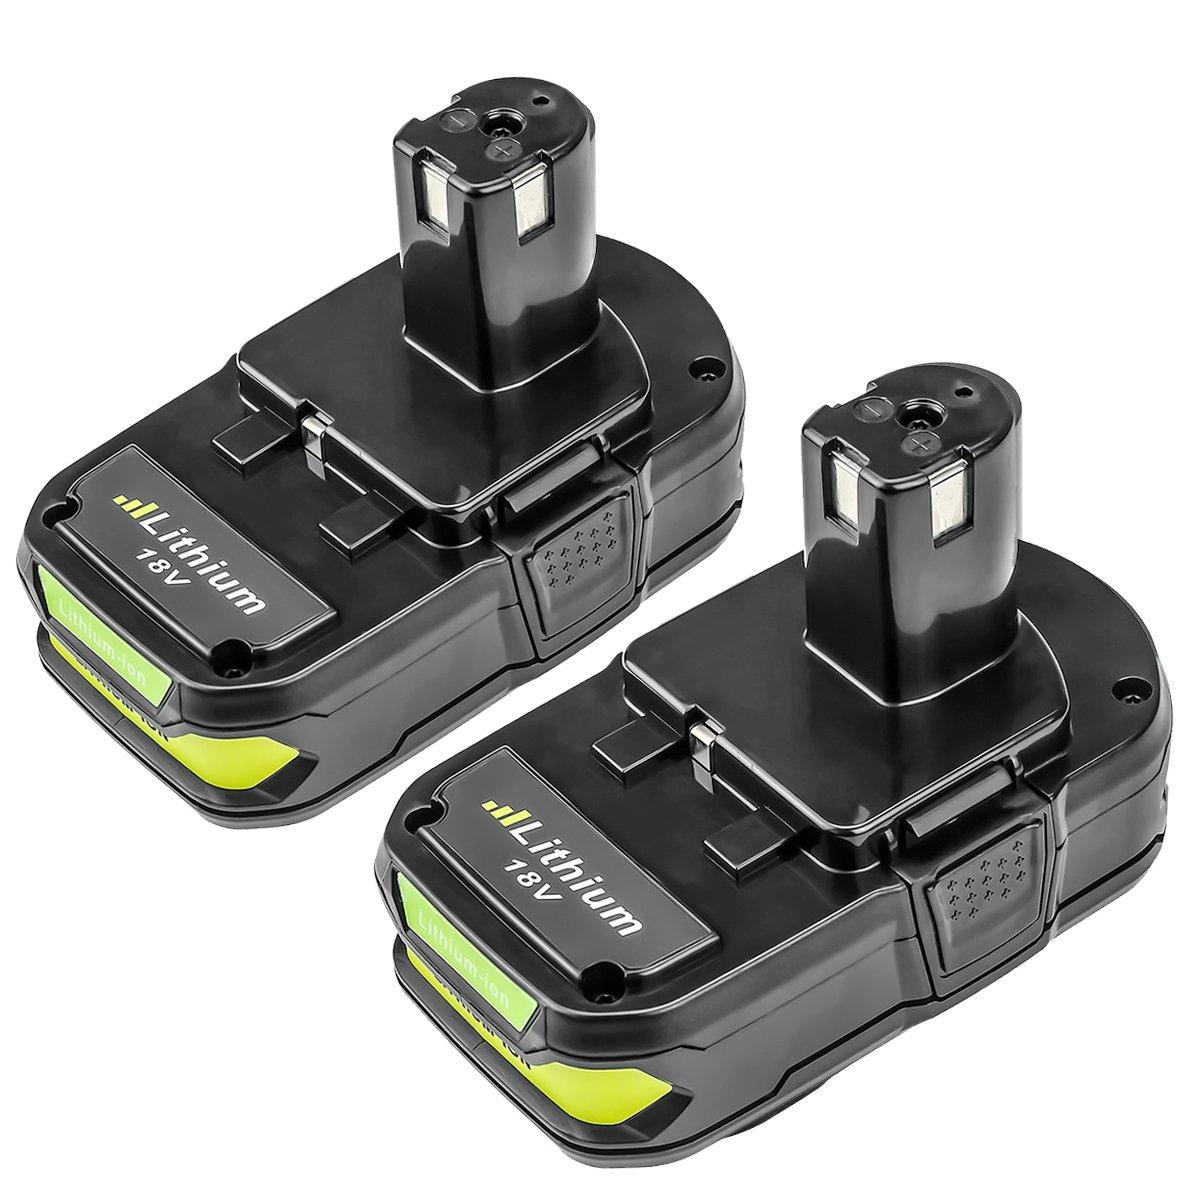 P102 2500mAh Replace for Ryobi 18V Battery P104 P105 P102 P103 P107 P108 for Ryobi 18-Volt ONE+ Plus Power Tool Batteries 2Pack